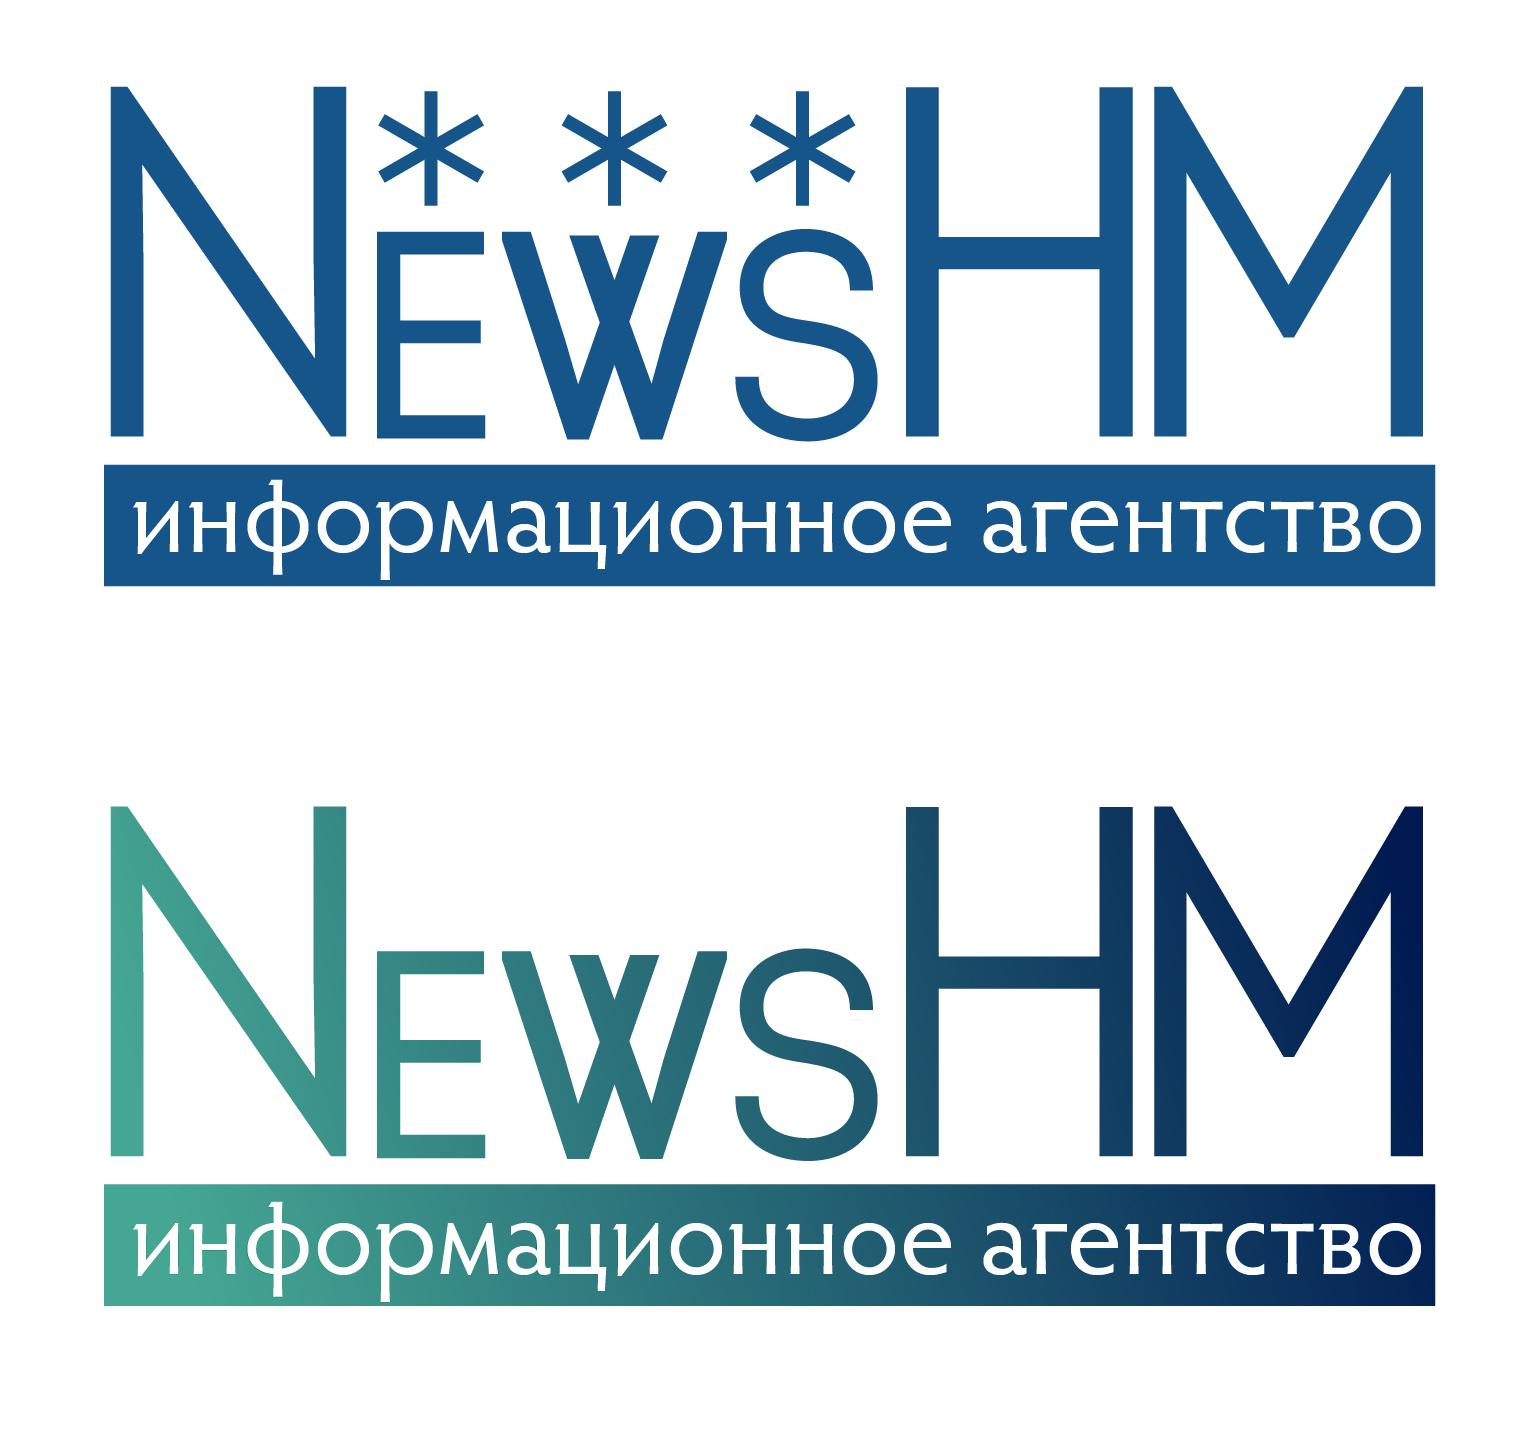 Логотип для информационного агентства фото f_8105aa3a6cf15c31.jpg